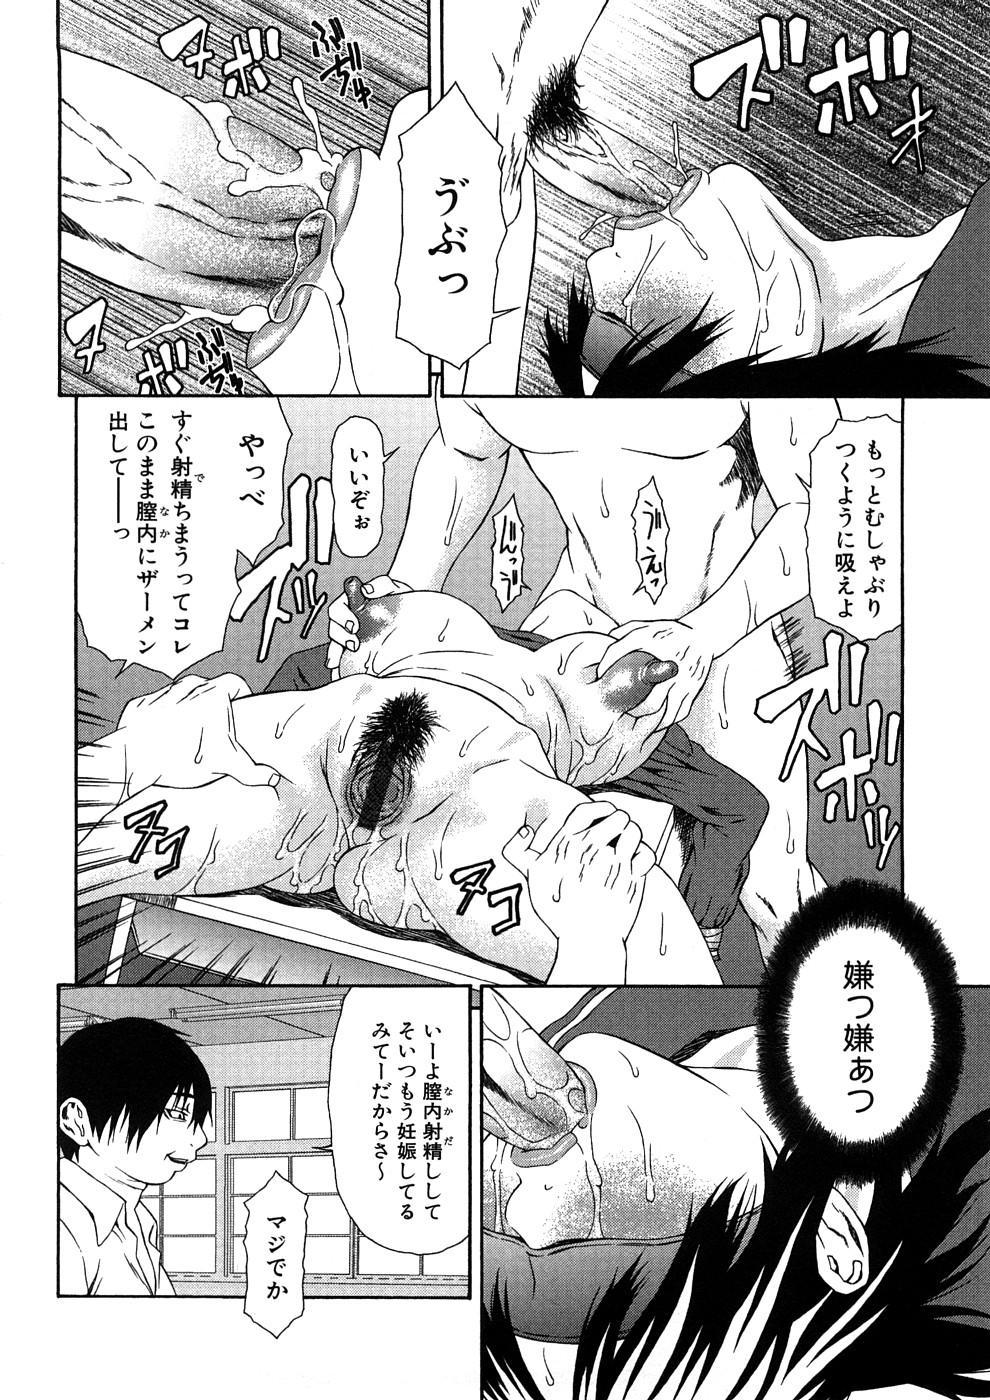 Geki Yaba Anthology Vol. 1 - Naka ni Dashite yo 194